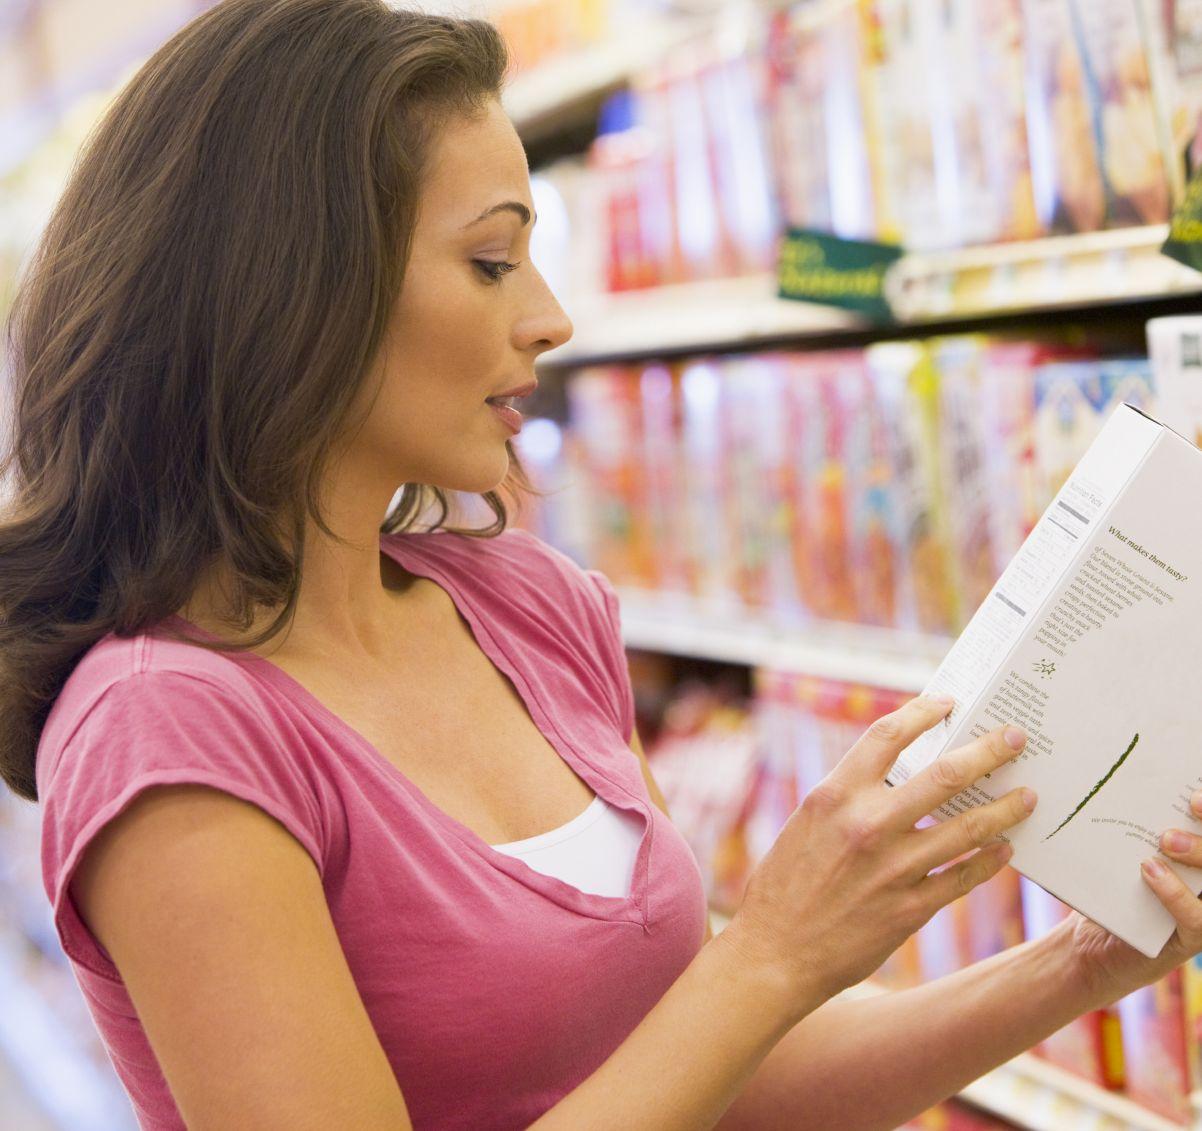 Women reading label